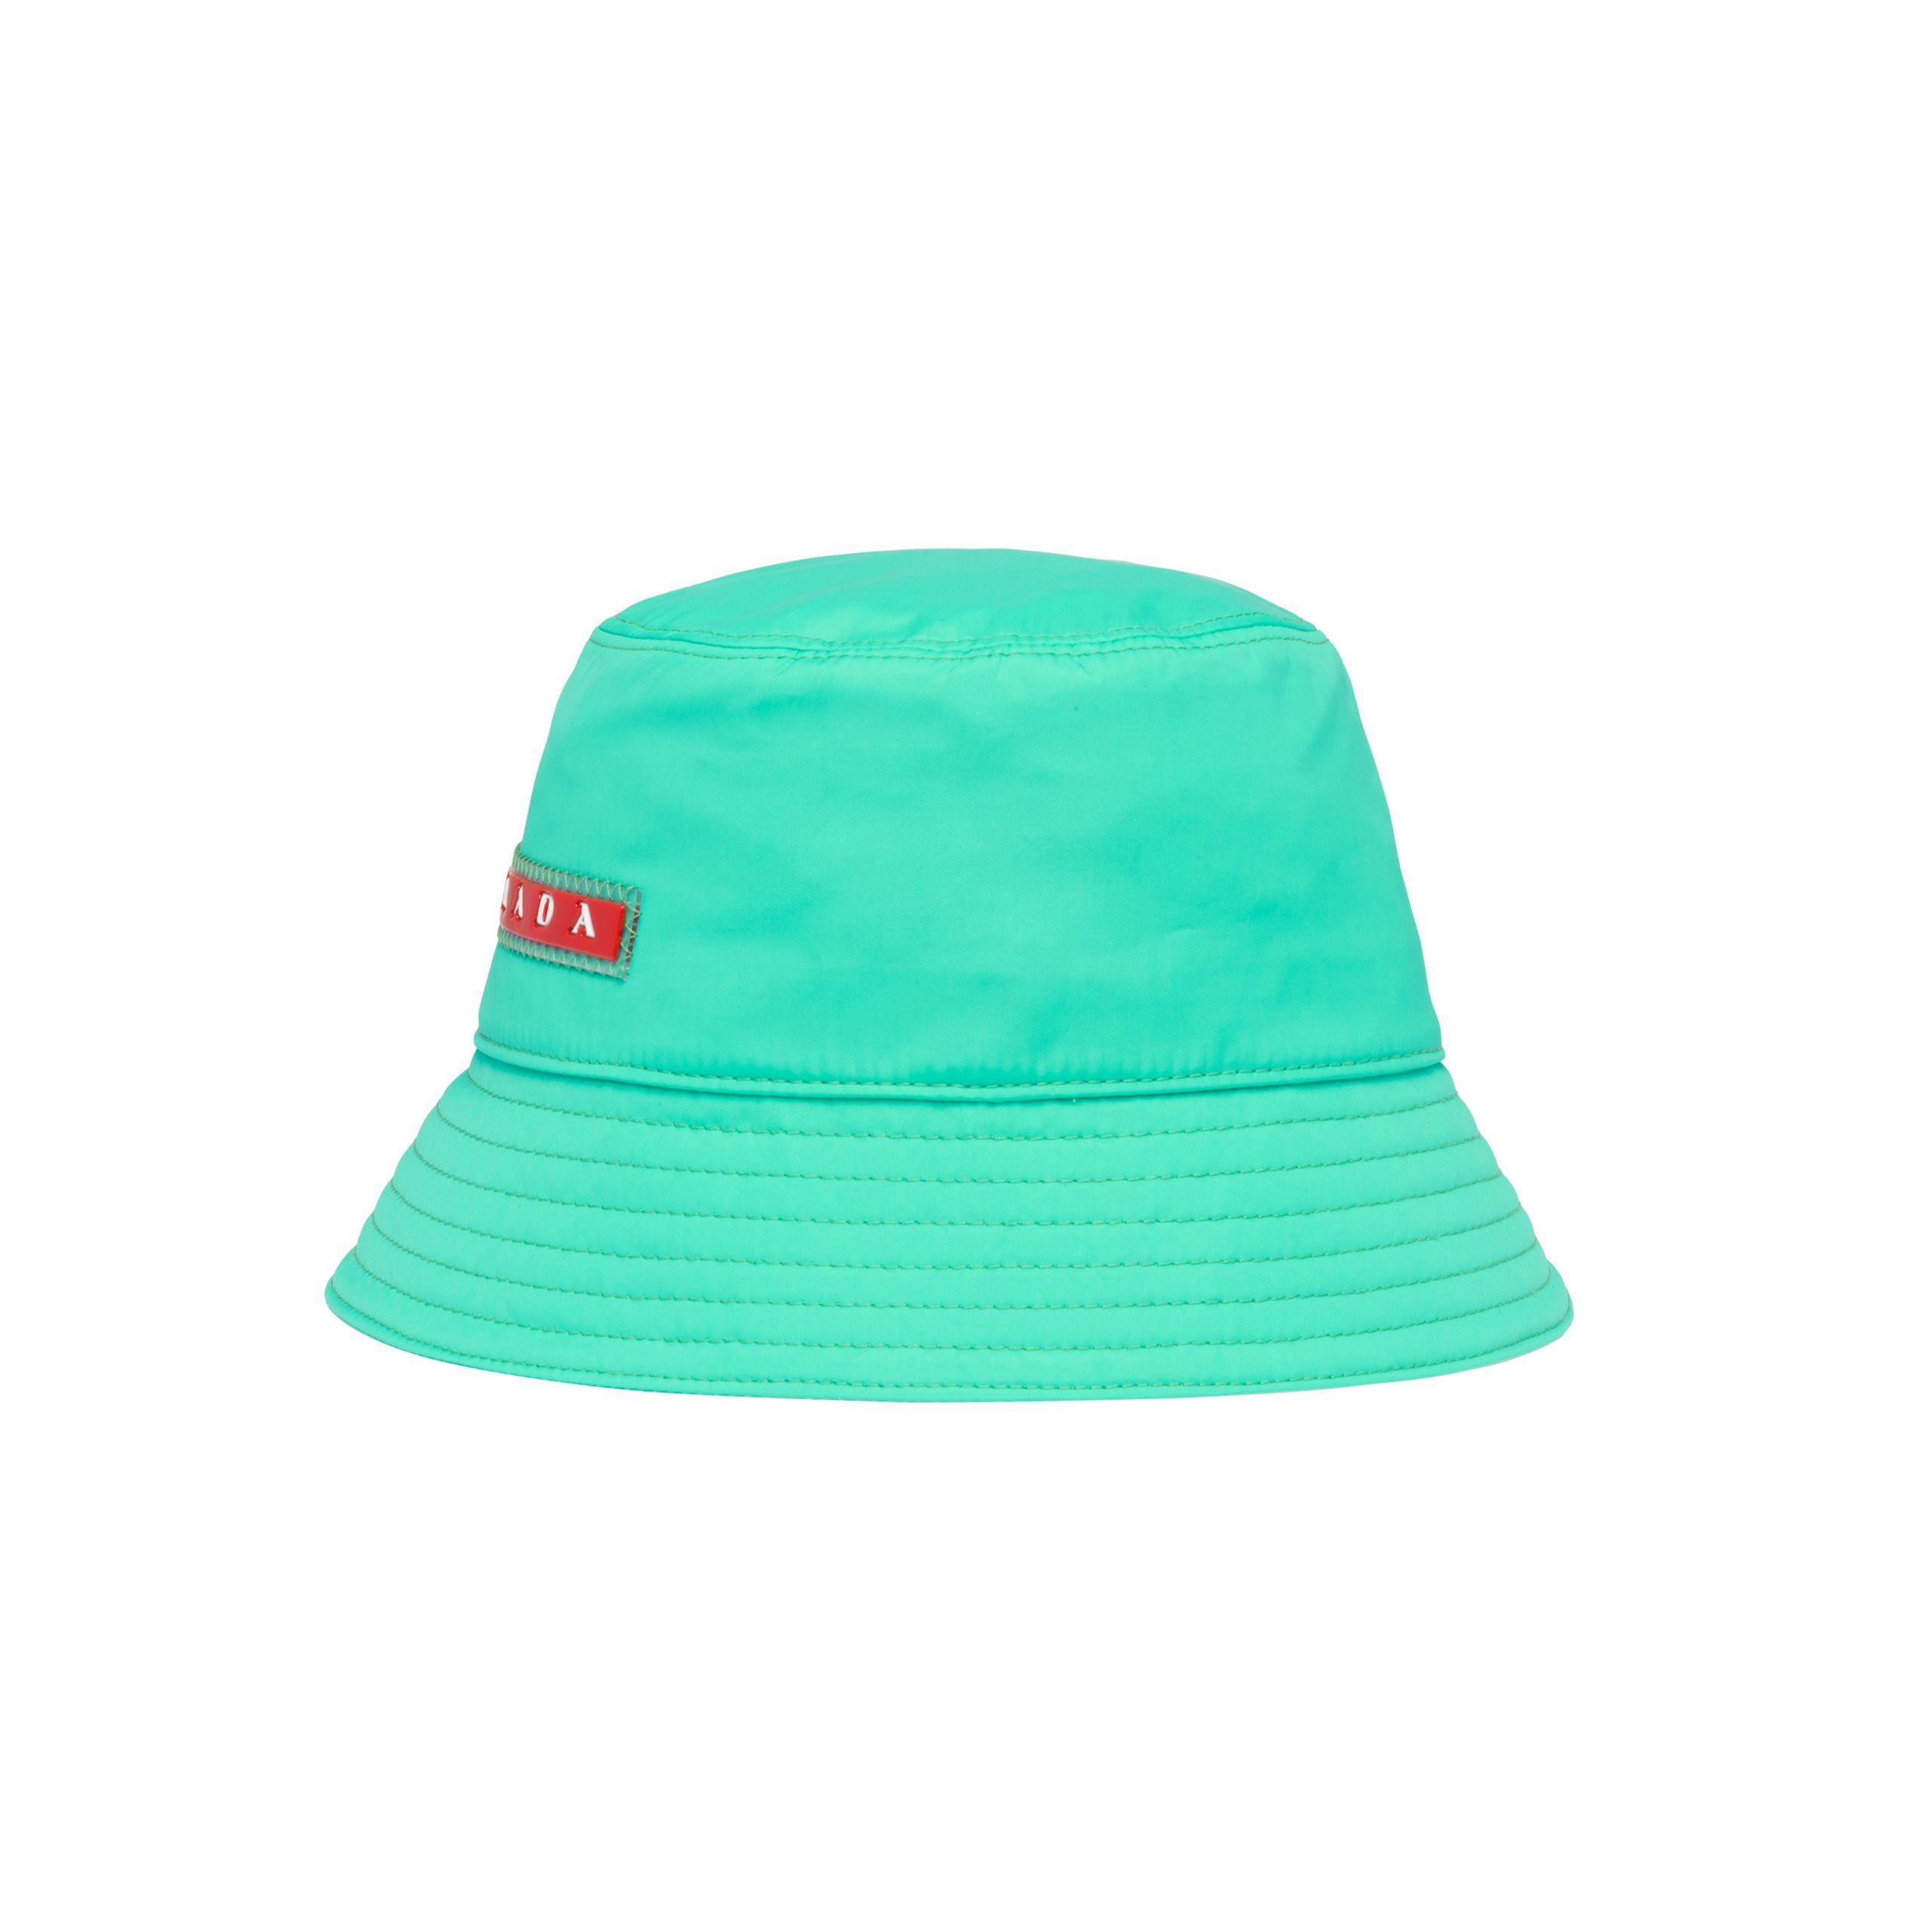 Prada. Women s Green Technical Fabric Cap.  340 From Orchard Mile 76b8f813aa29